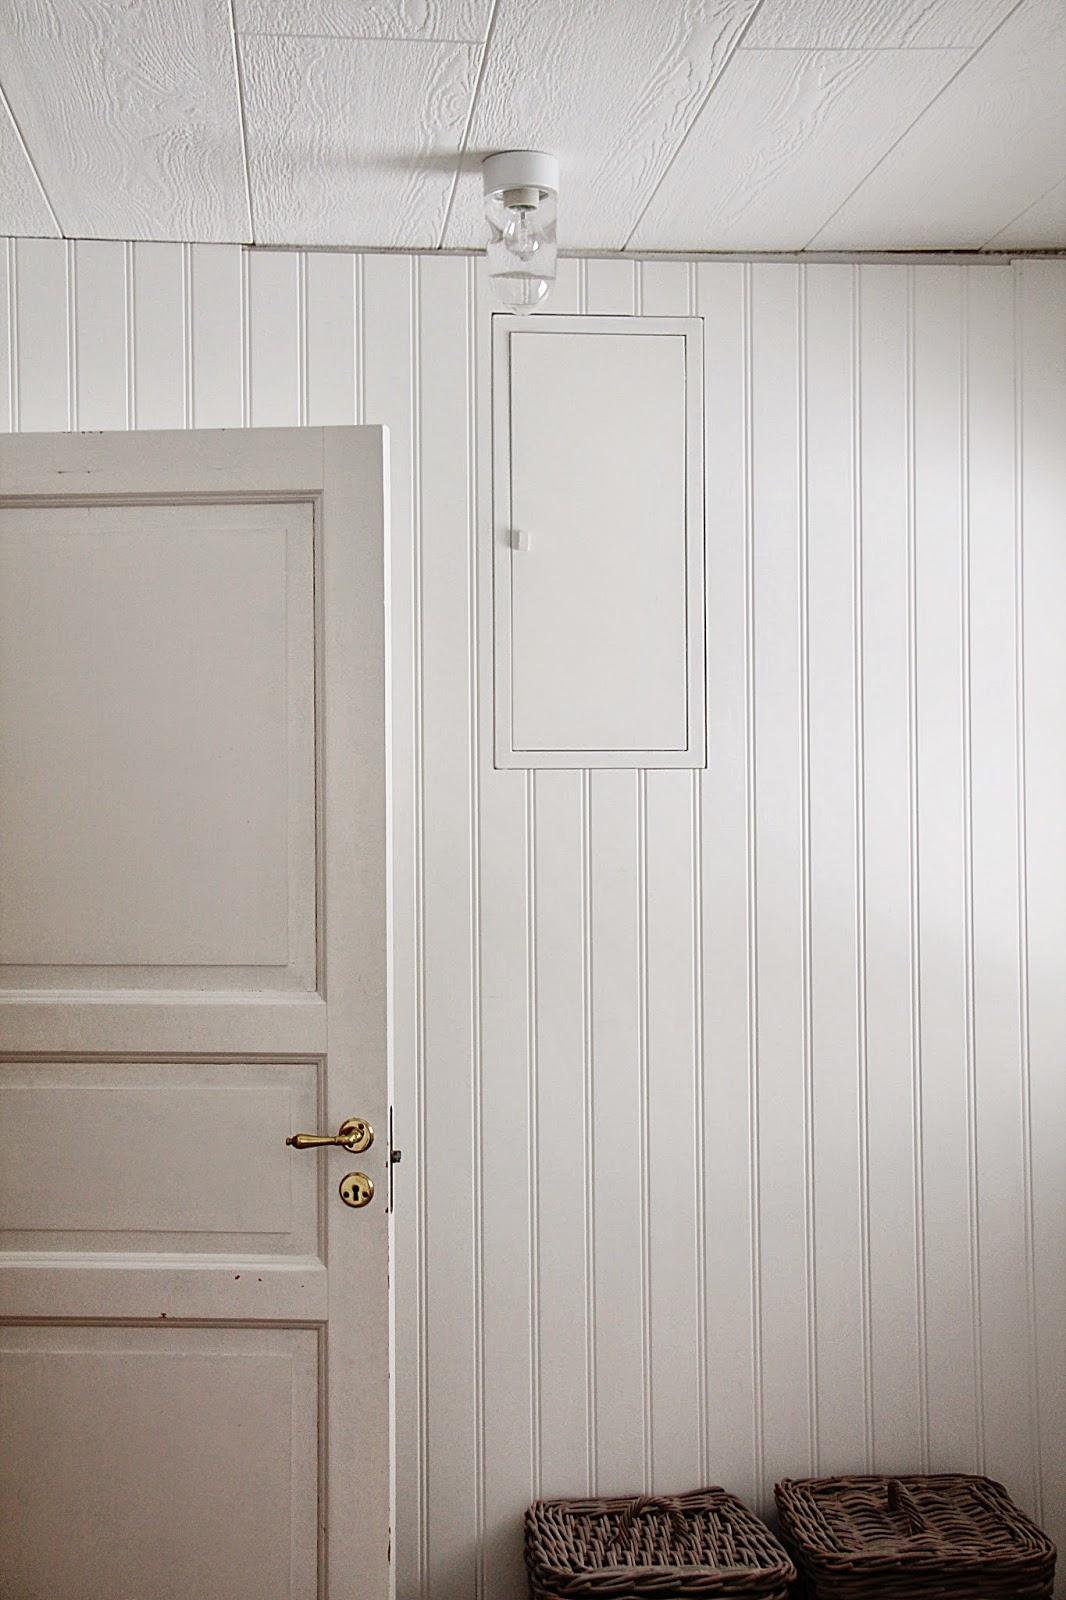 A house with a view: taklampor till tvÄttstugan